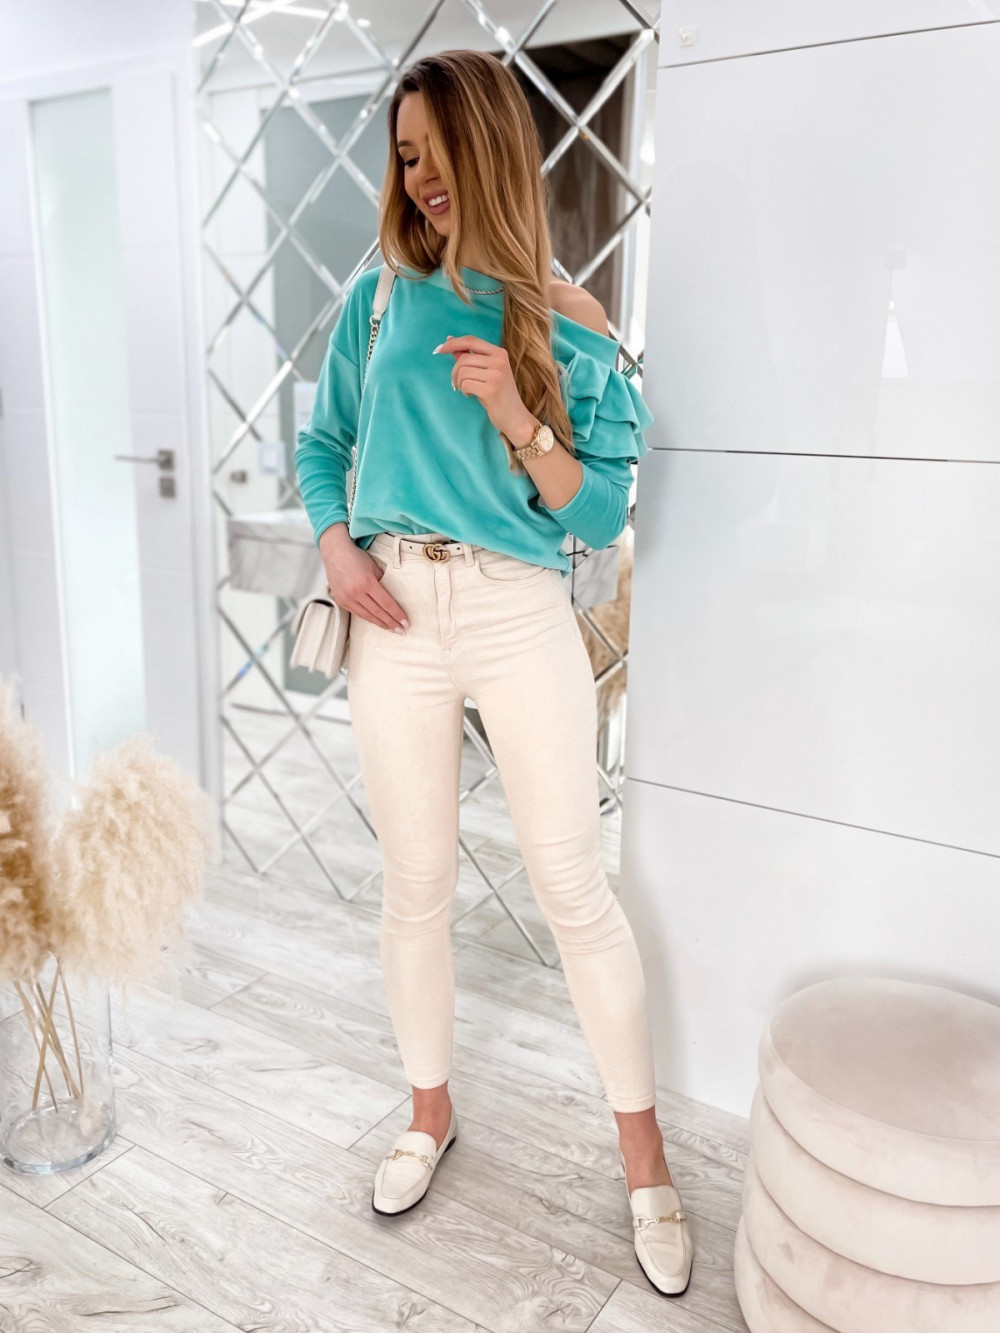 Morska bluza na jedno ramię z falbanami Jasmine 2